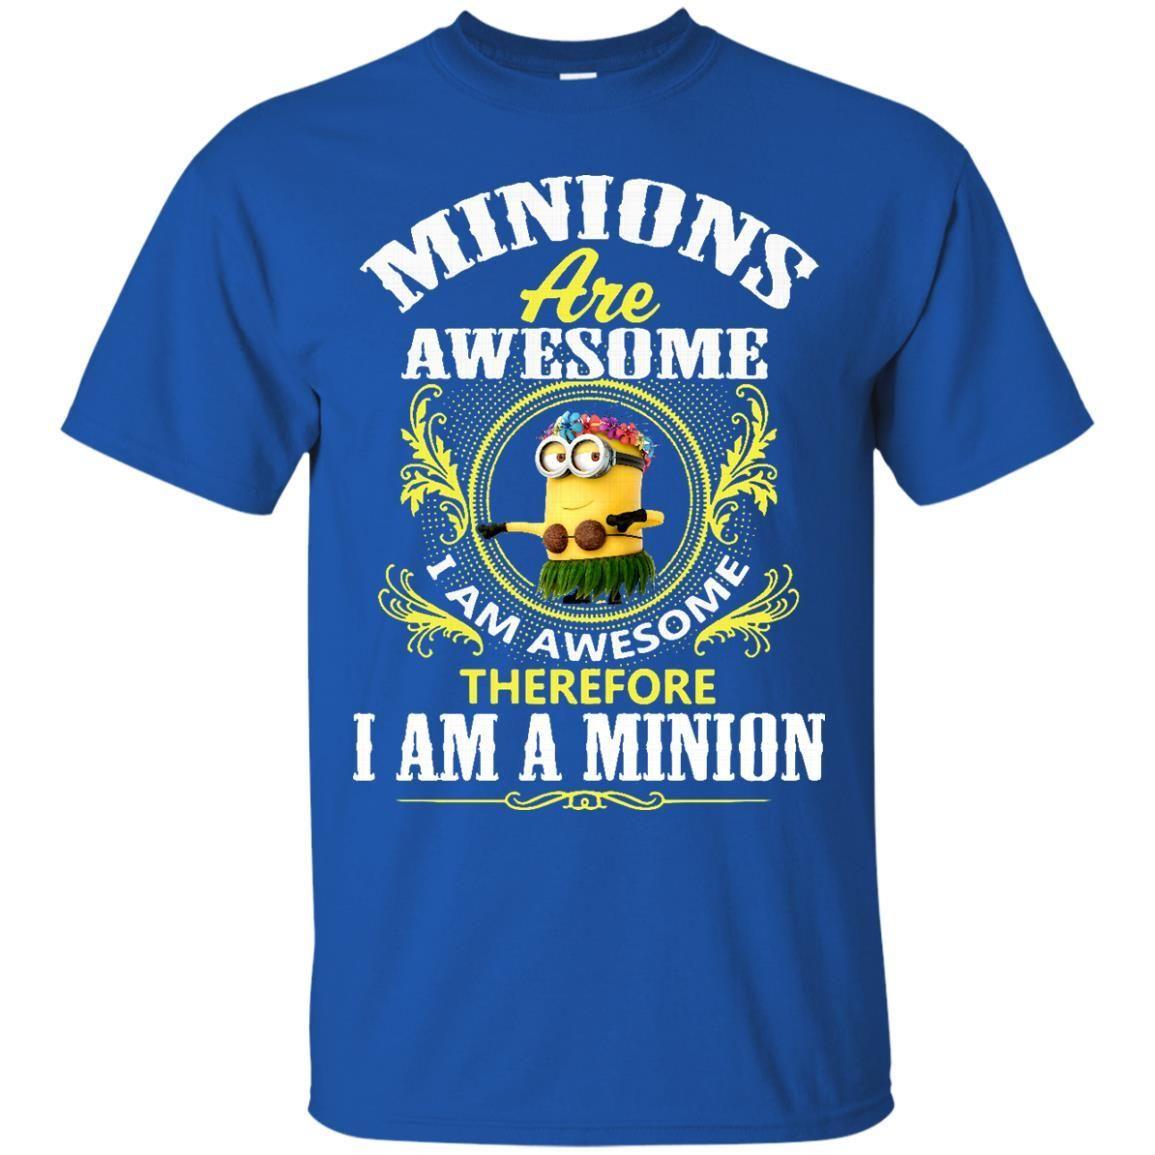 Minion T shirts Minion Are Awesome Hoodies Sweatshirts